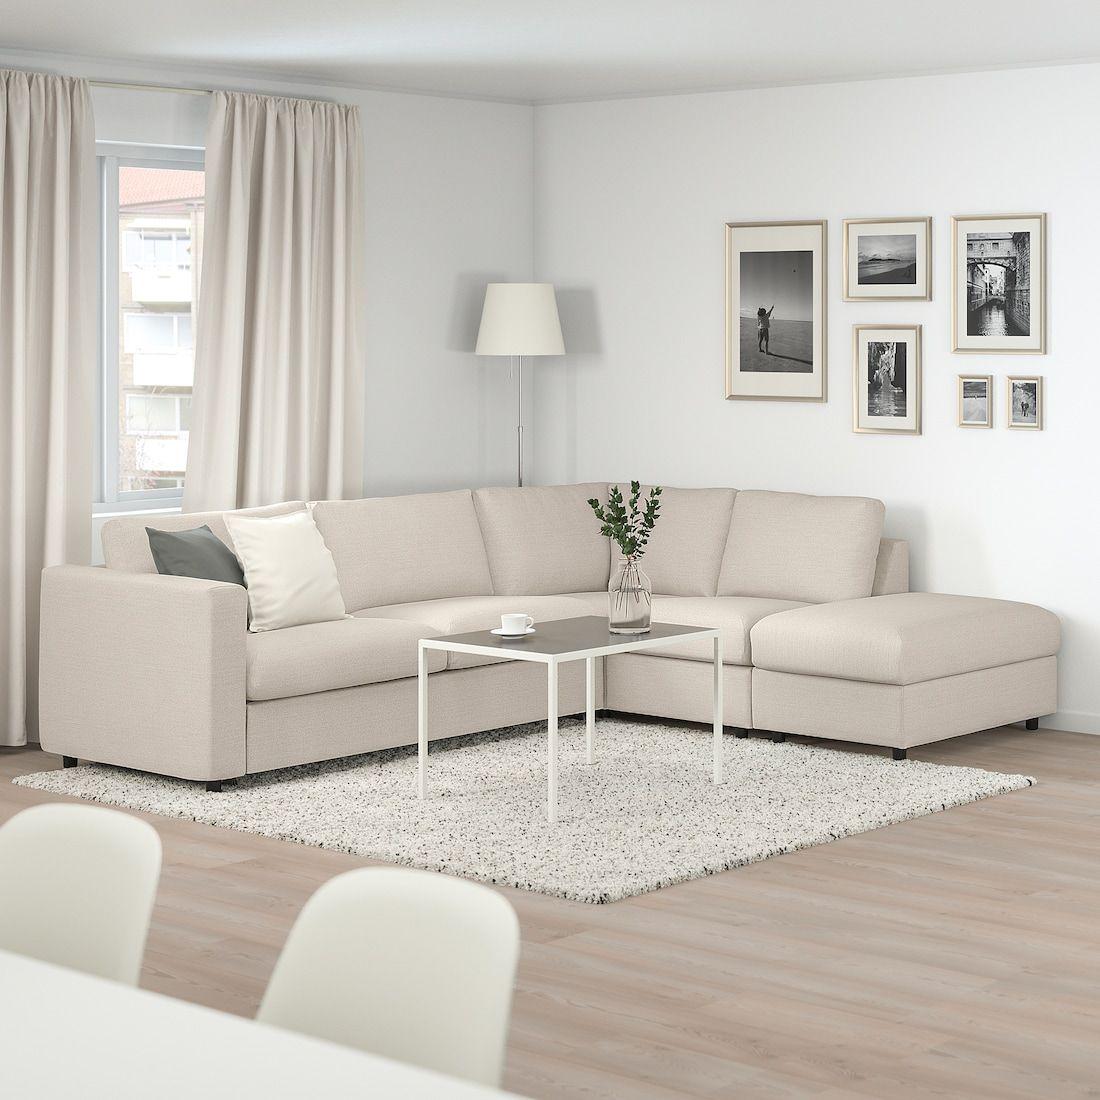 VIMLE Corner sleeper sofa, 5-seat - with open end, Gunnared beige